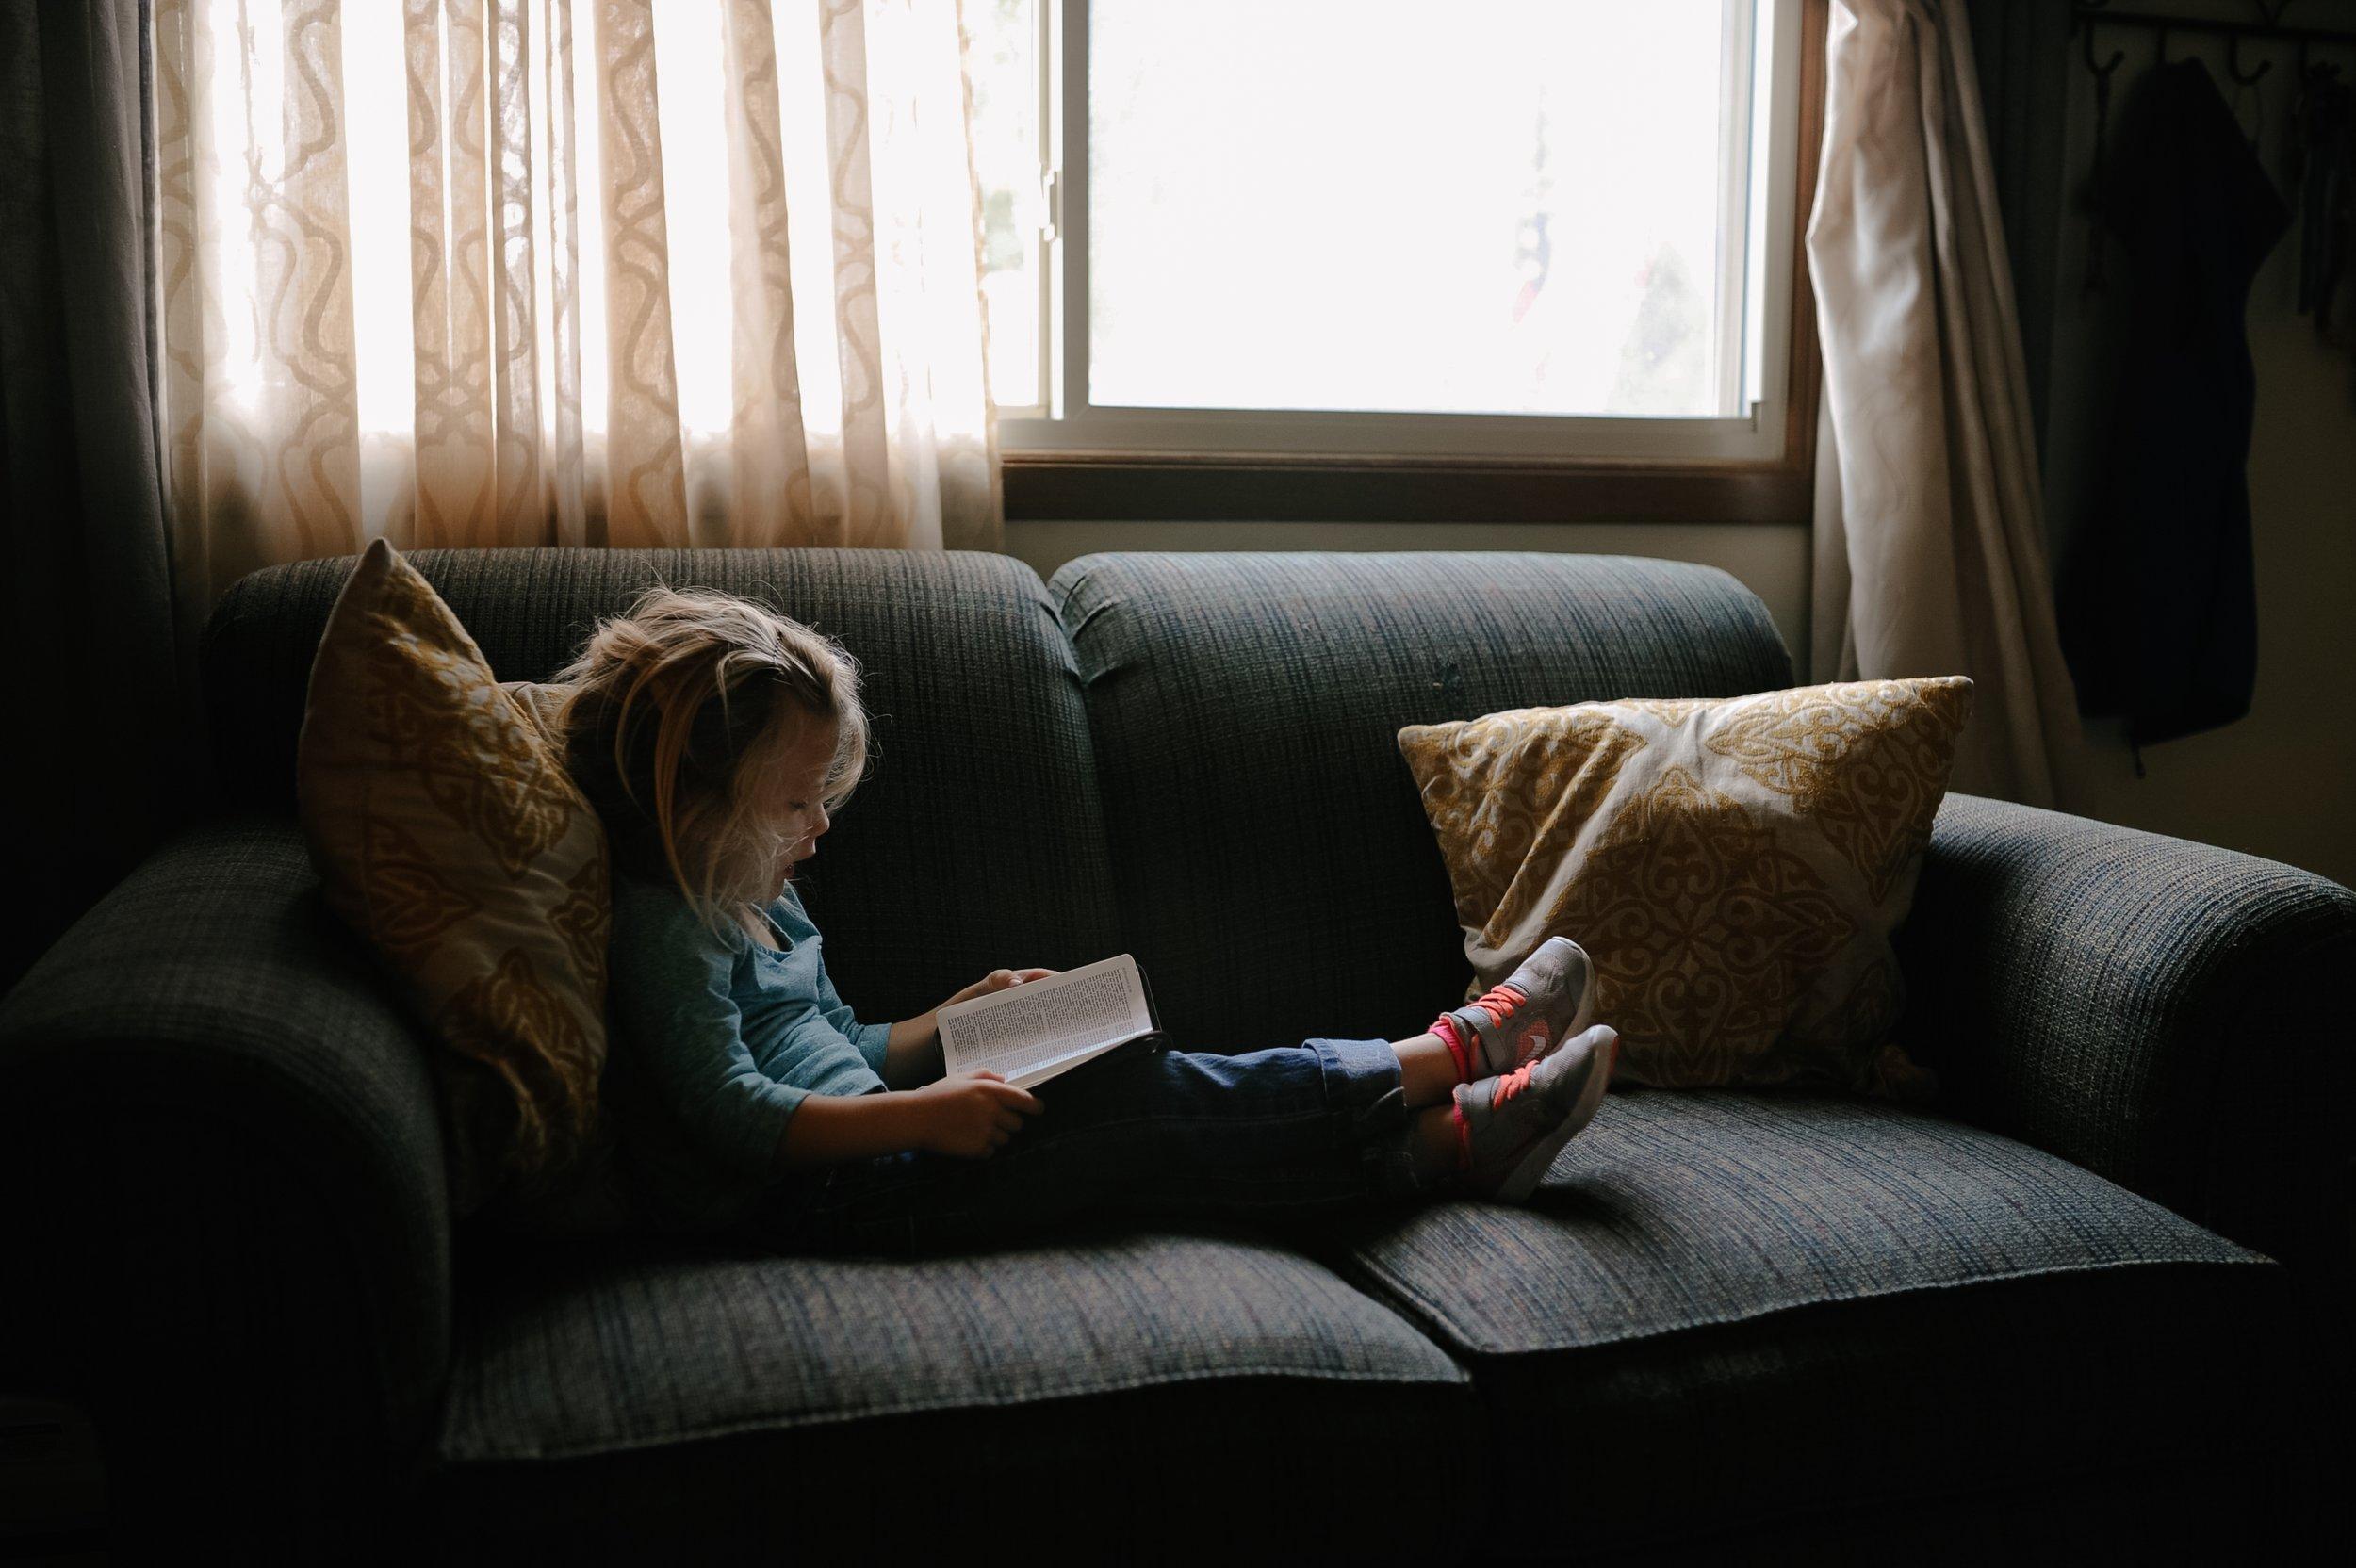 negative-space-small-child-girl-reading-book-josh-applegate.jpg